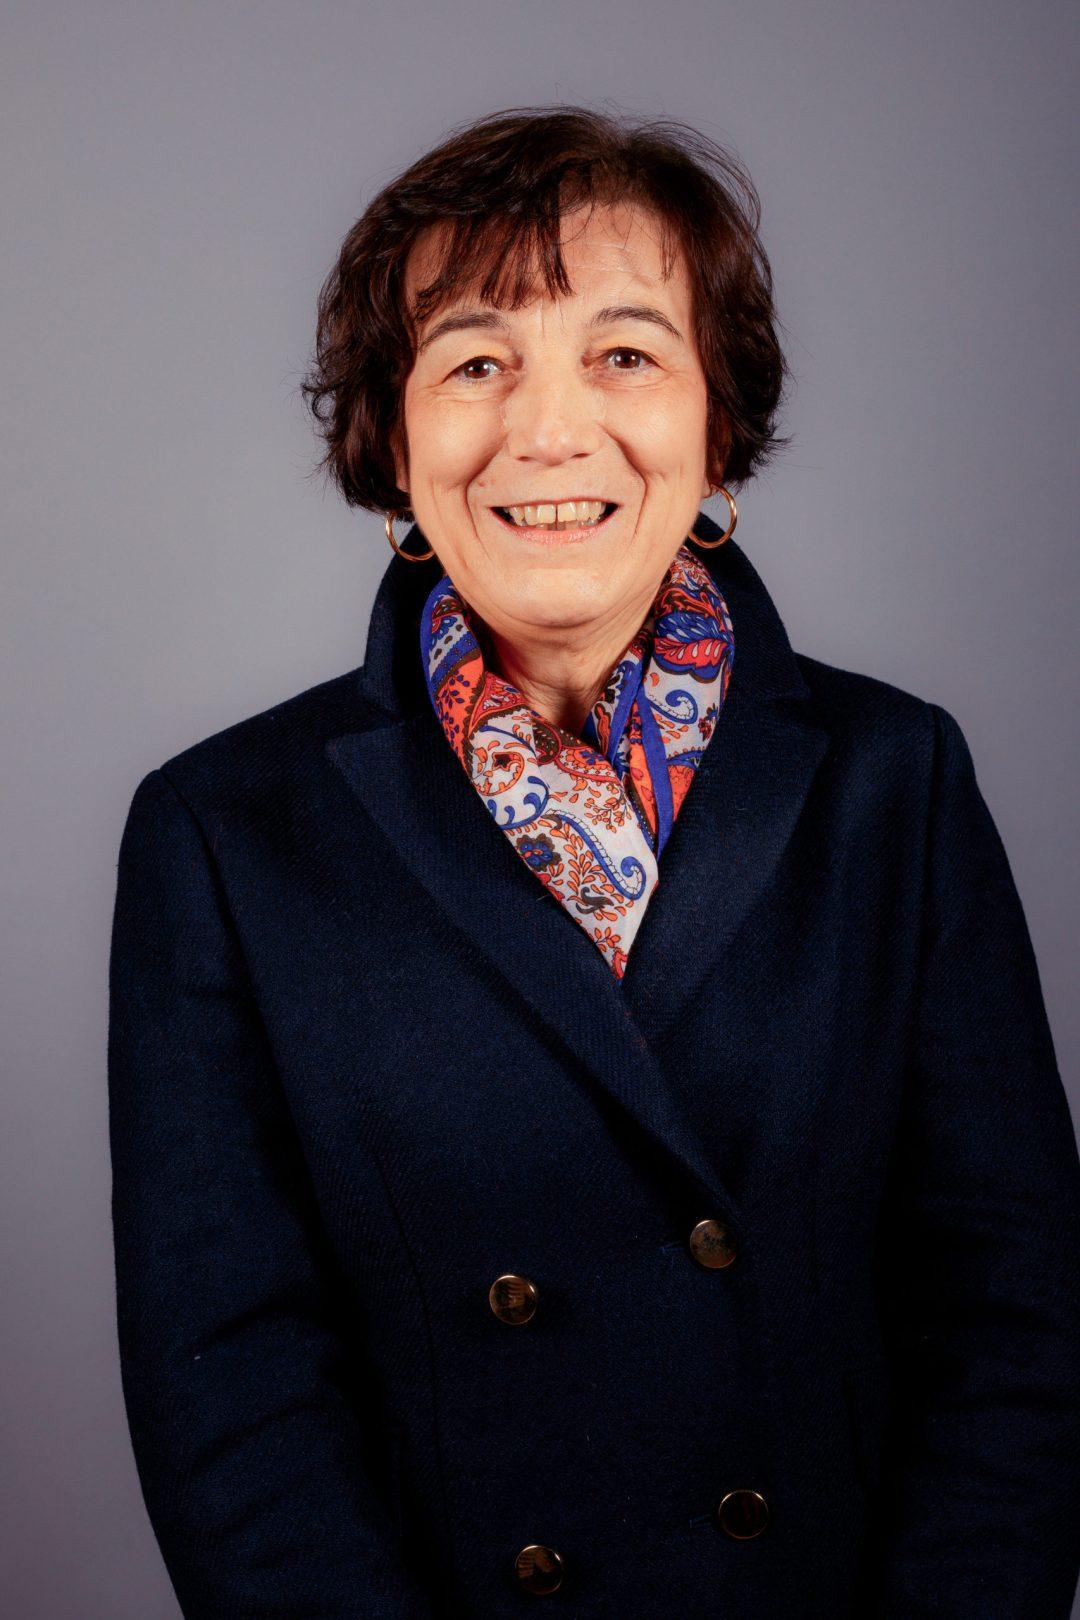 Myriam SEVENERY